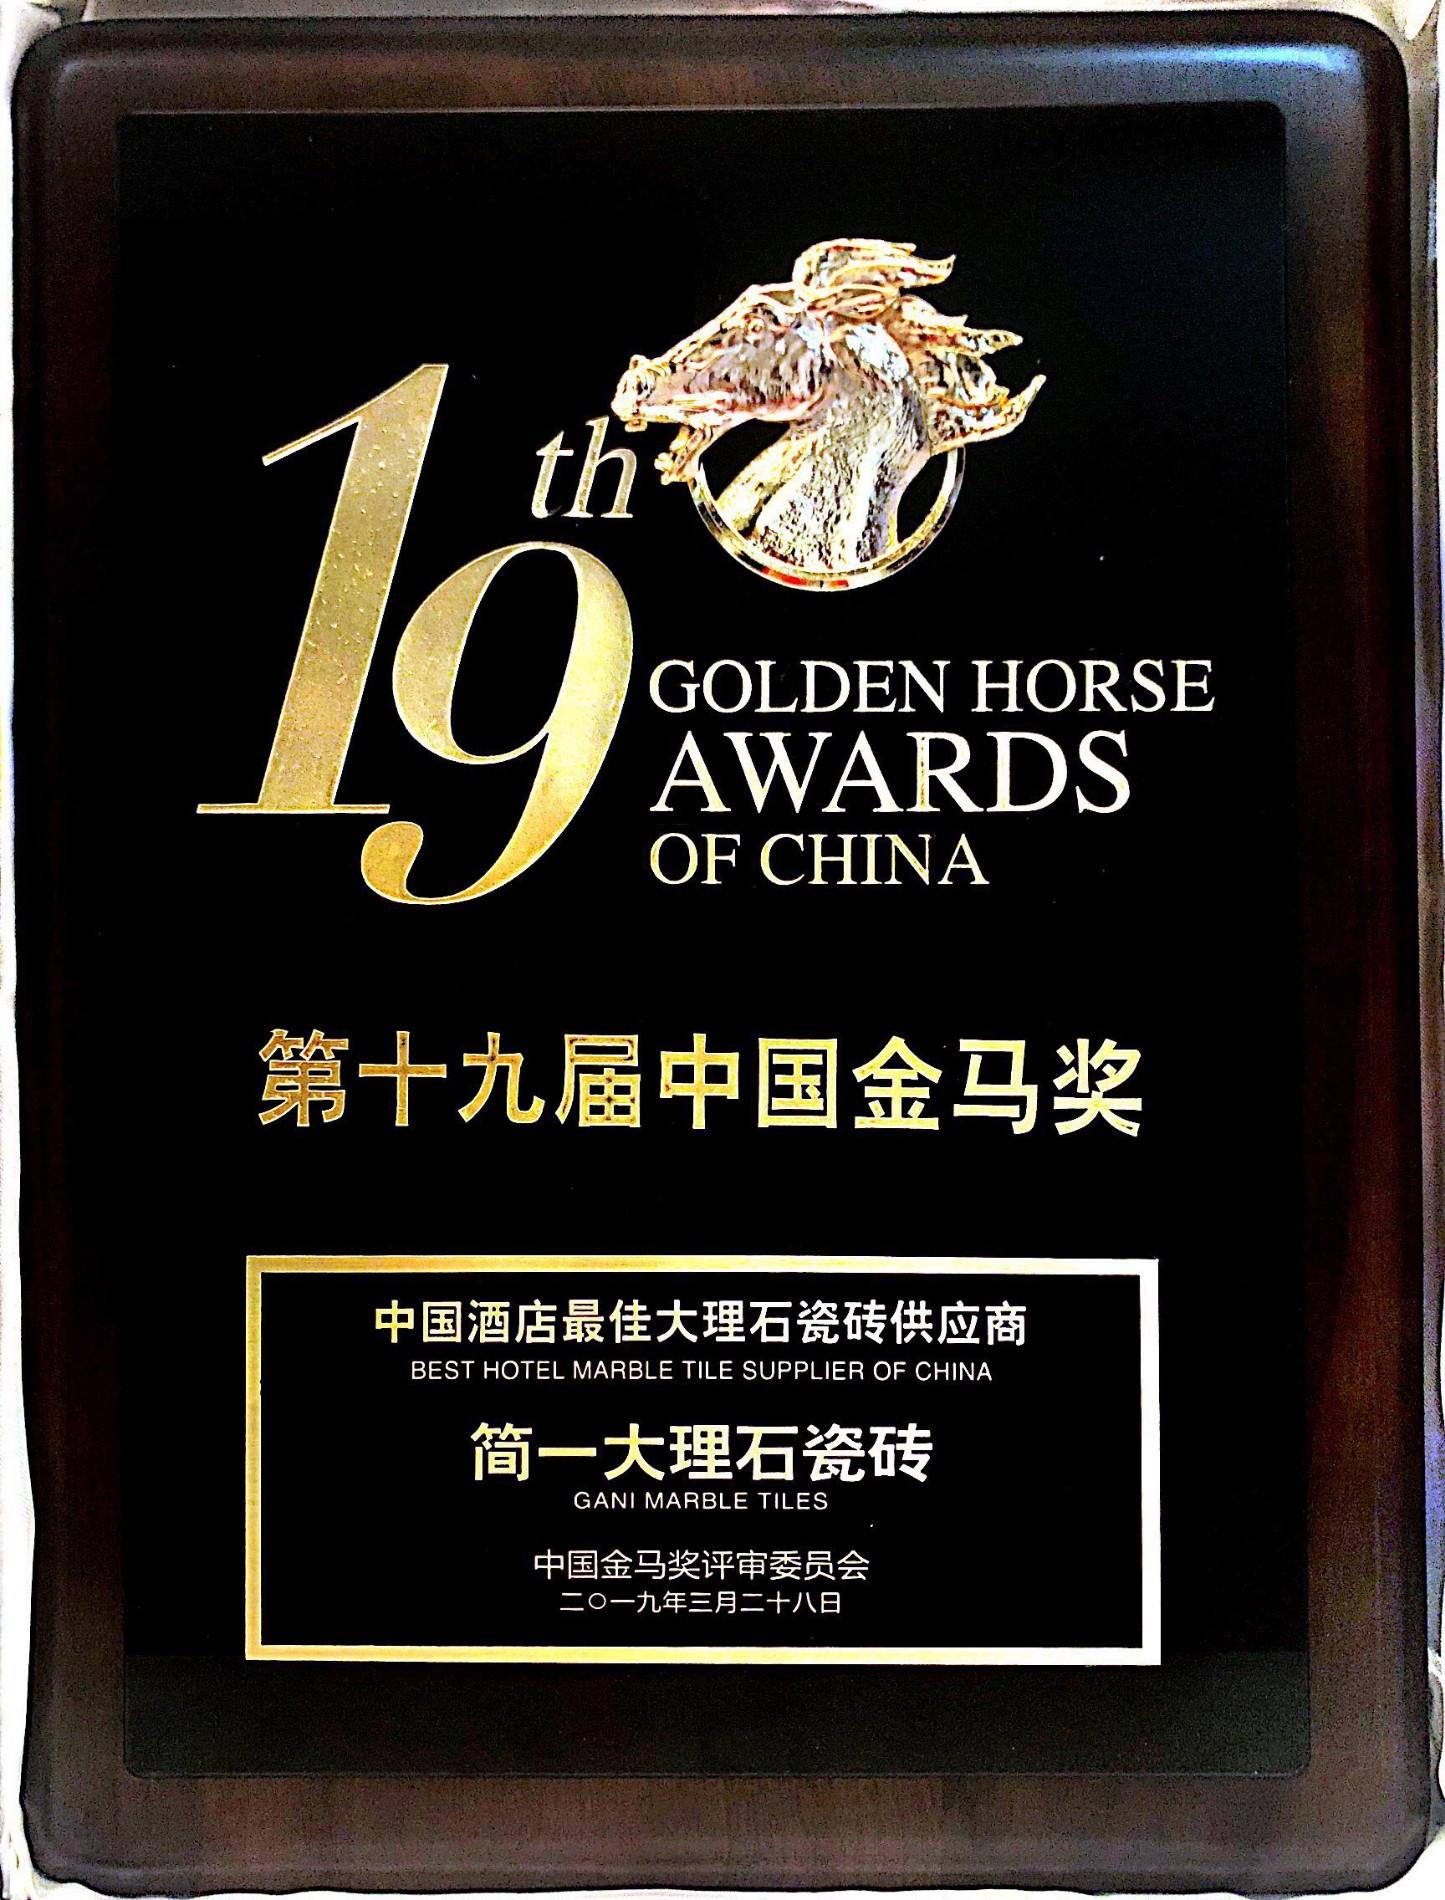 Pembekal Ubin Marmer Hotel Terbaik ke-19 dari China oleh Golden Horse Awards